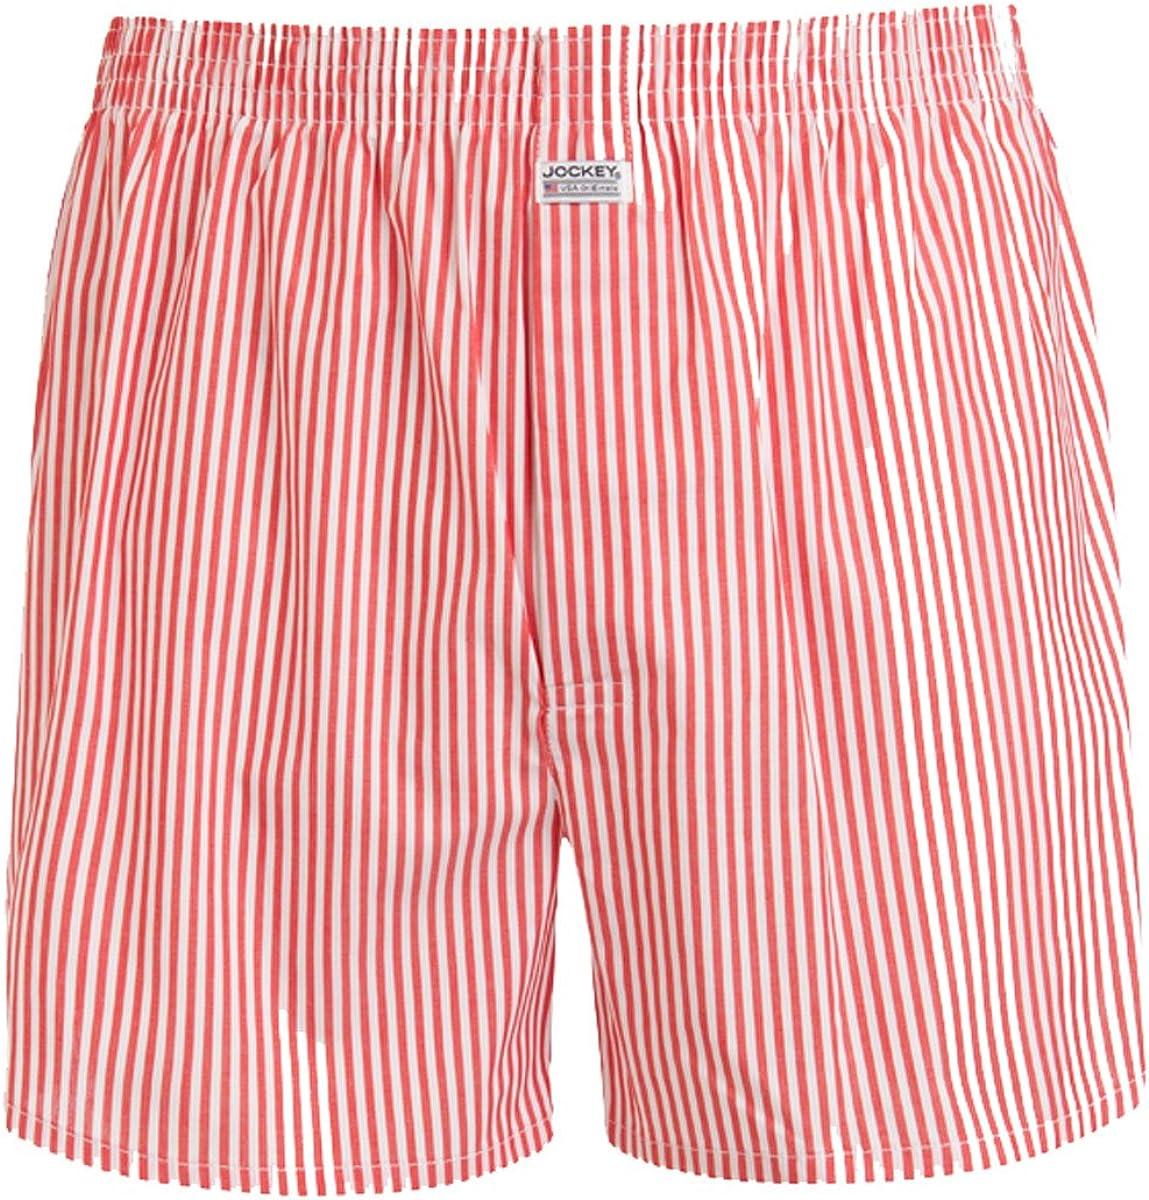 Jockey Striped Woven Mens Boxer Shorts Red//White